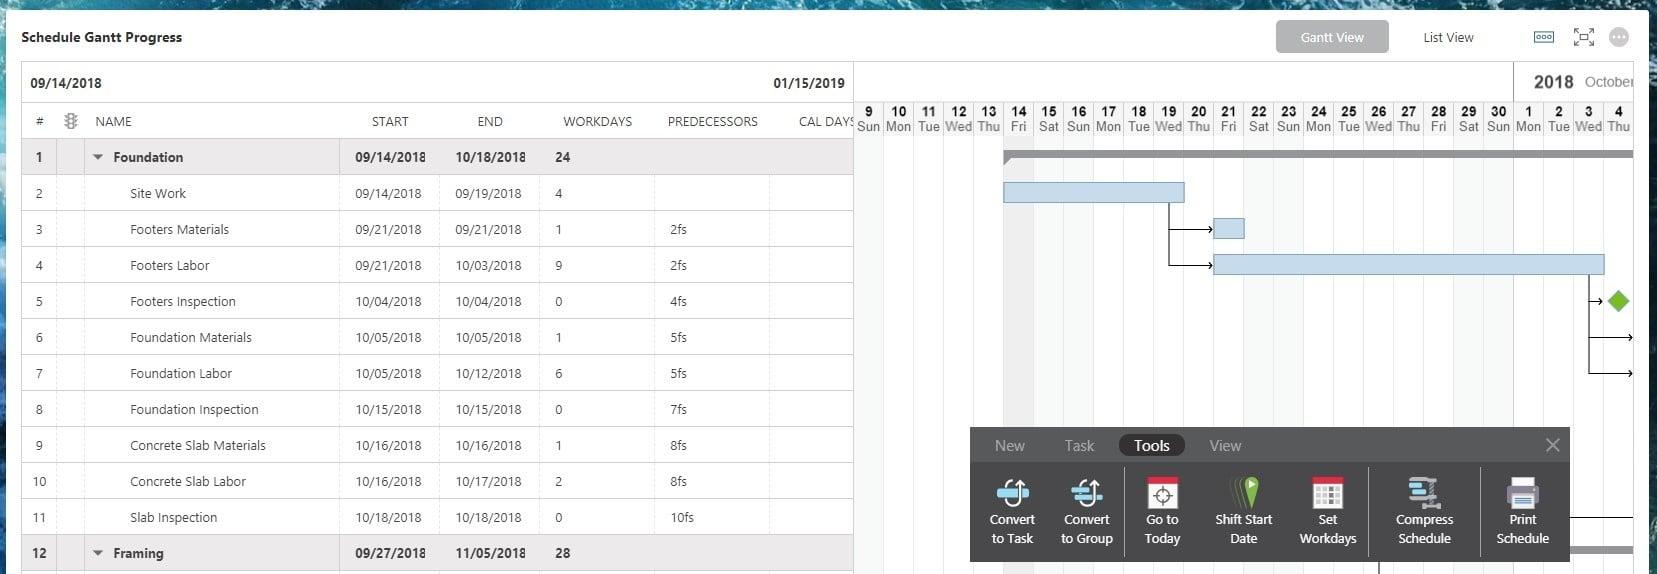 Compress Schedule New COL